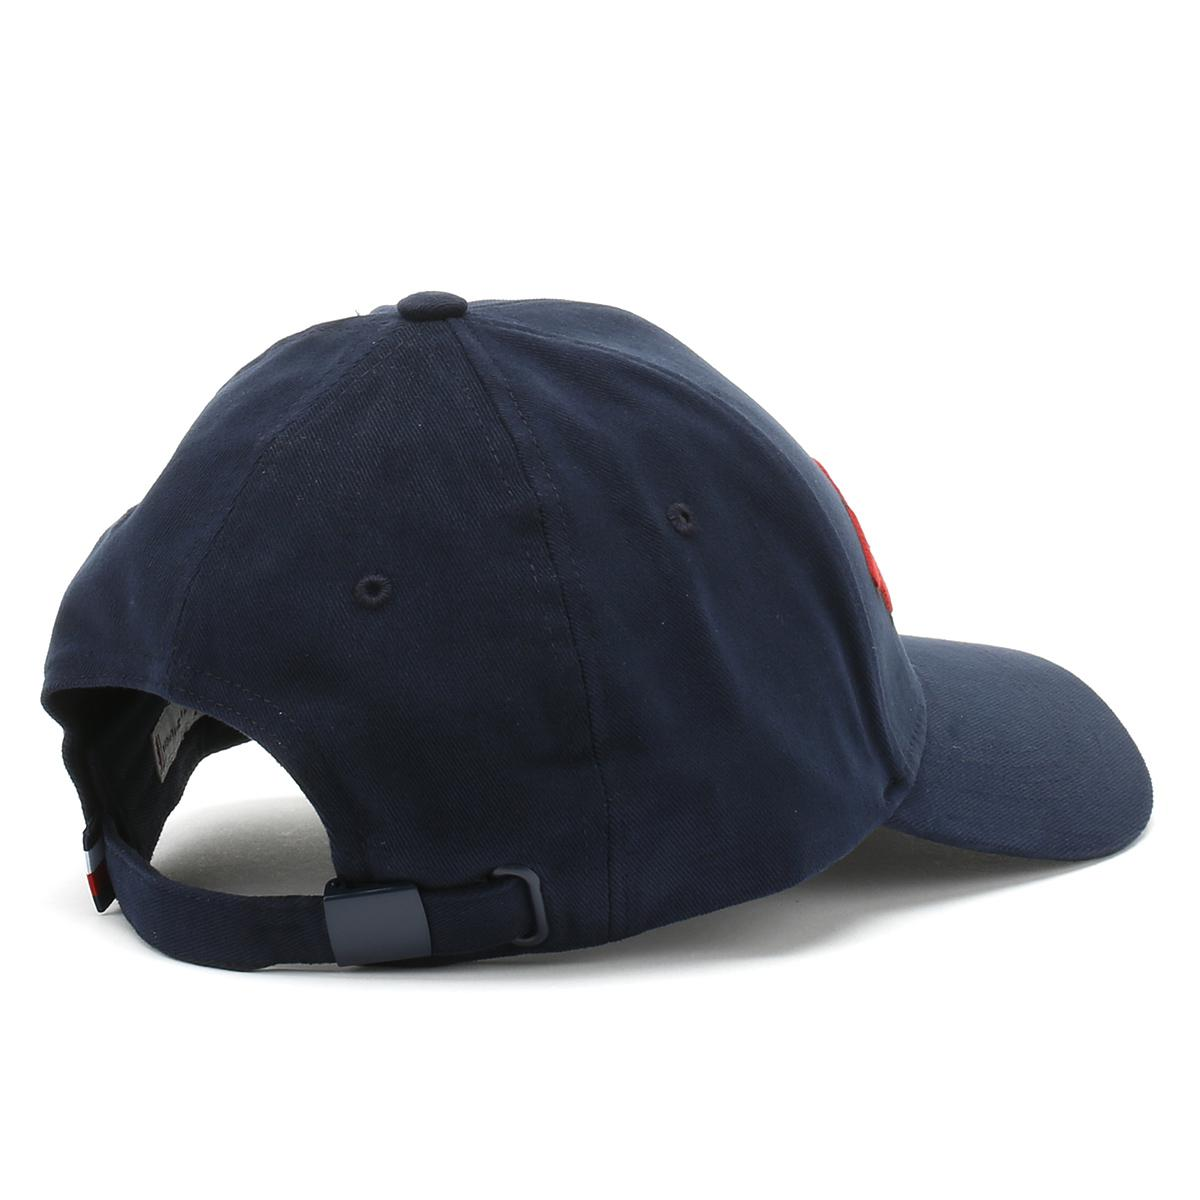 separation shoes 38926 d1817 ... hat cap flex fit b2e33 86fef  where can i buy womens navy patch cap  lyst. view fullscreen 692e7 c4460